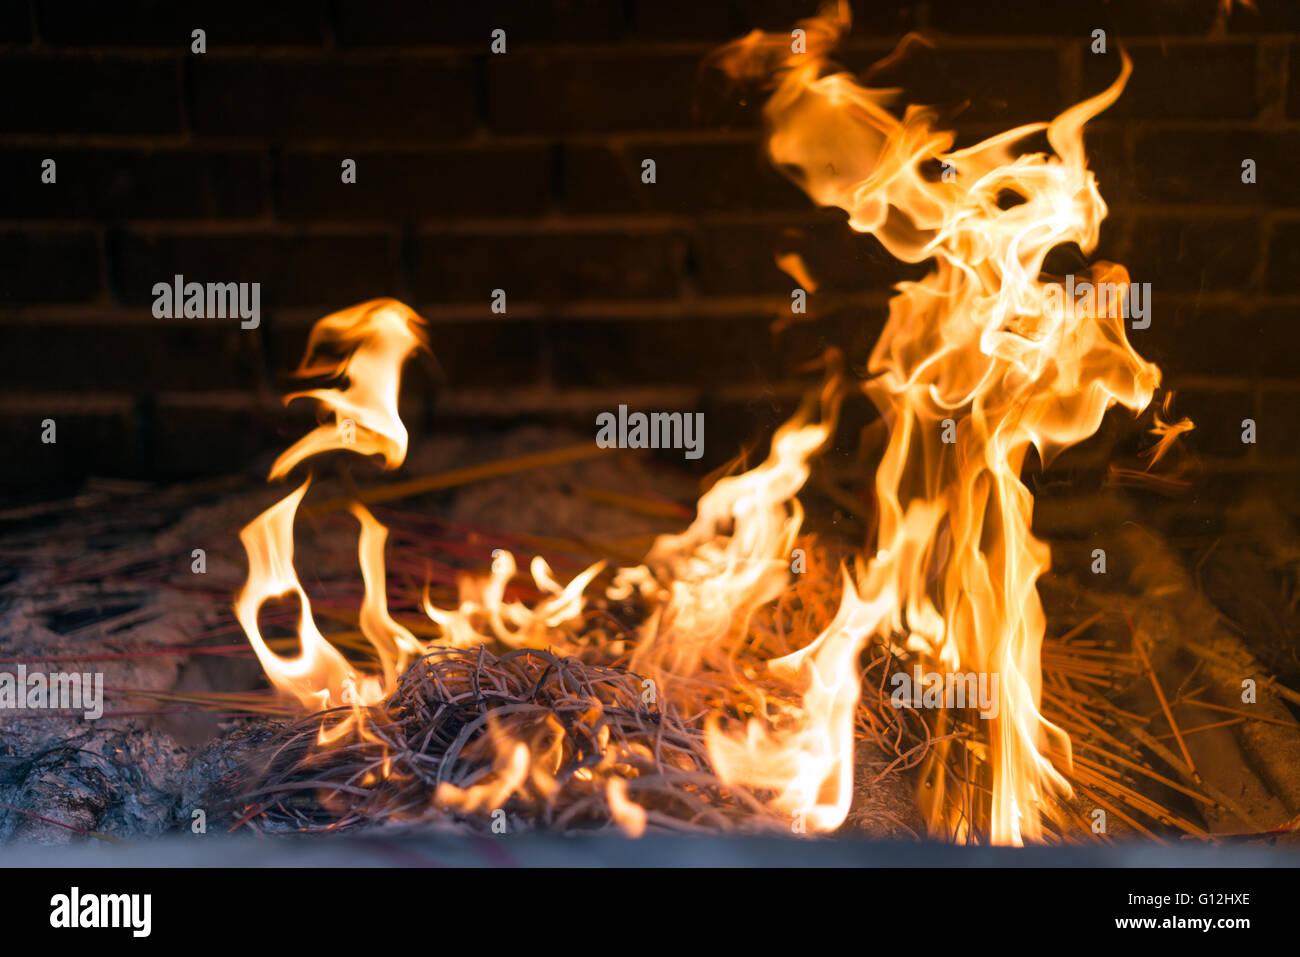 Money To Burn Stock Photos & Money To Burn Stock Images - Alamy